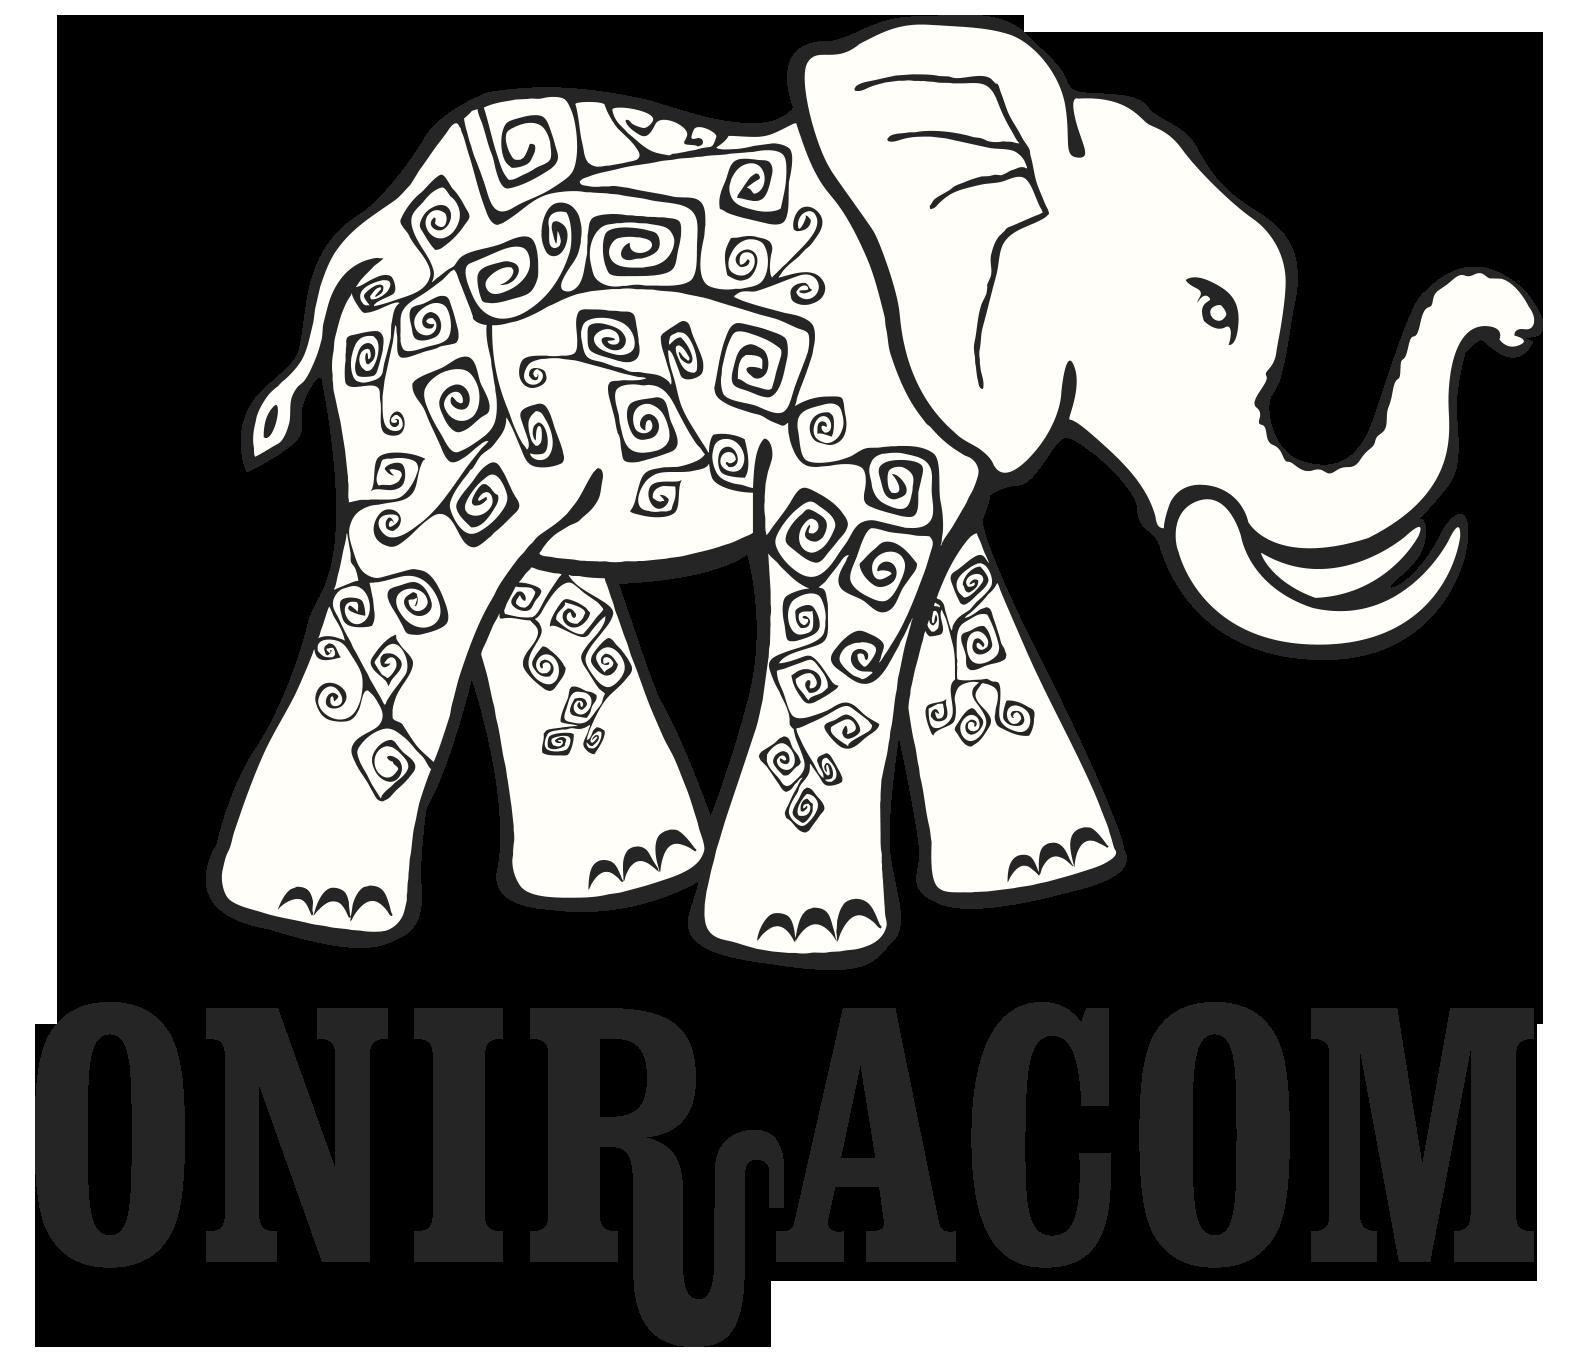 Oniracom-Logo-4Color-Vert-noslogan.png